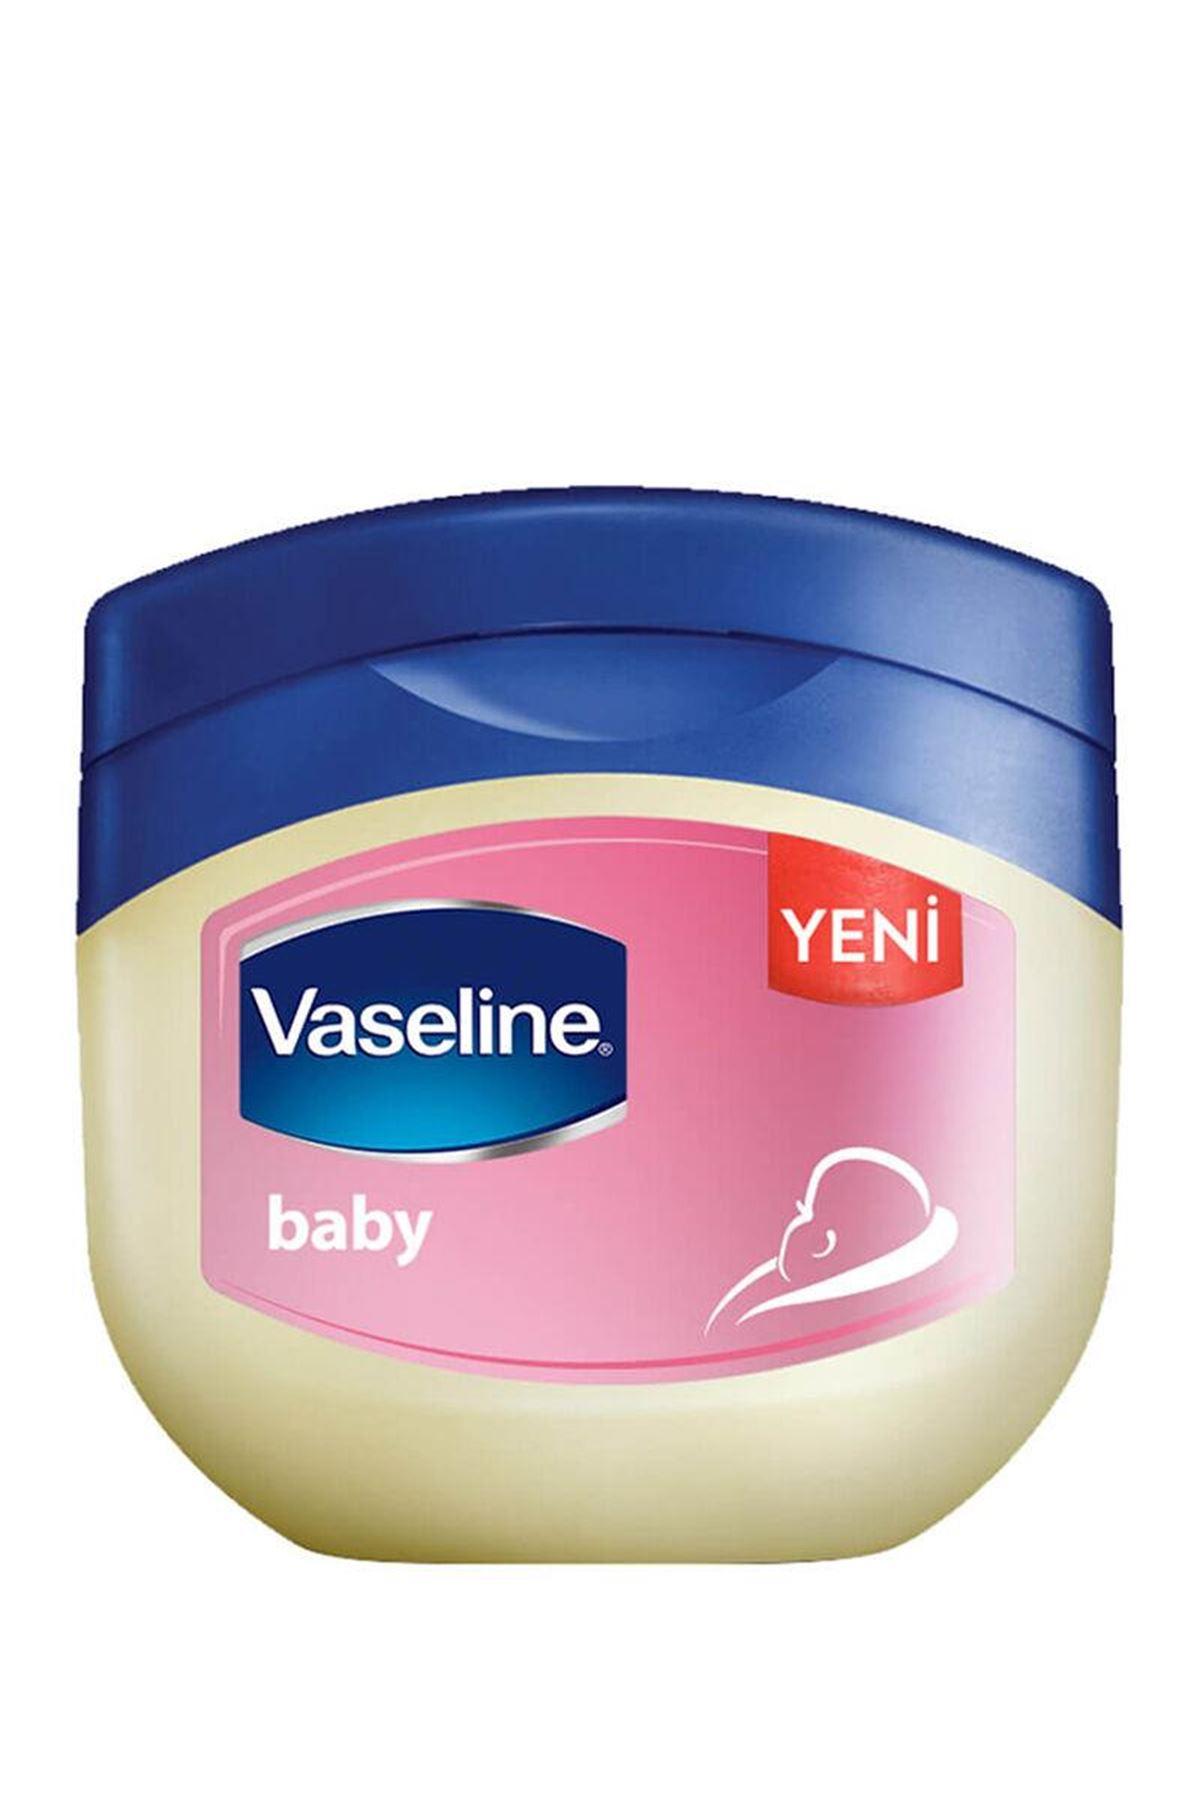 Vaseline Jel Baby Vücut Nemlendiricisi 100 ml